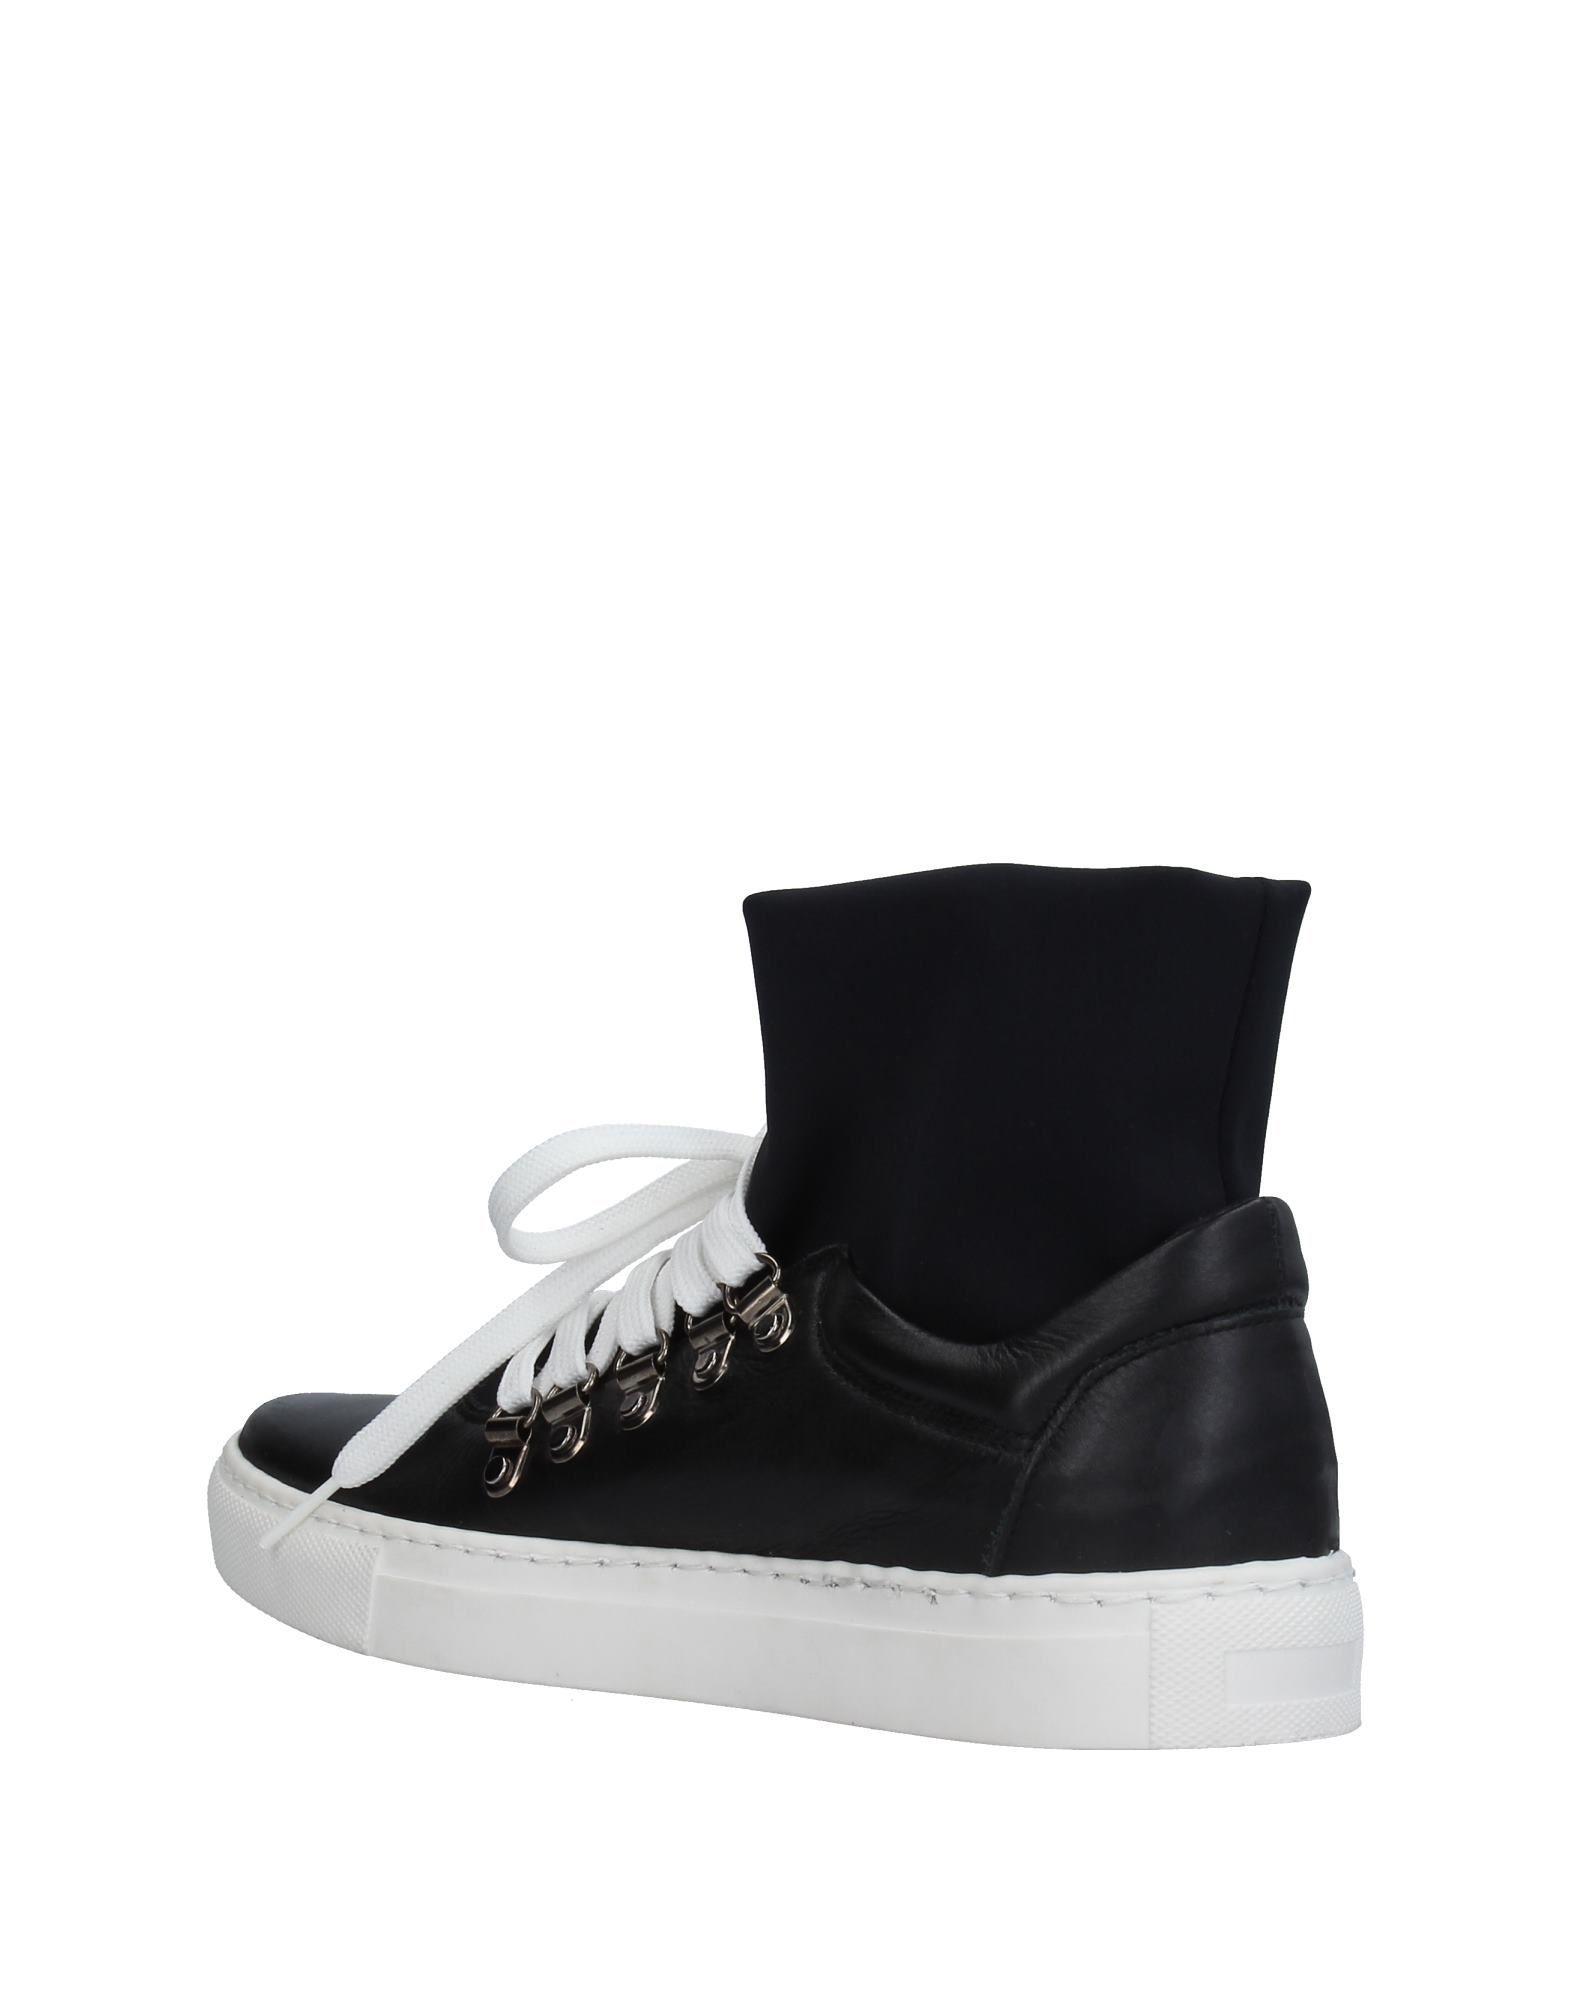 Footwear Brawn's Black Women's Calf